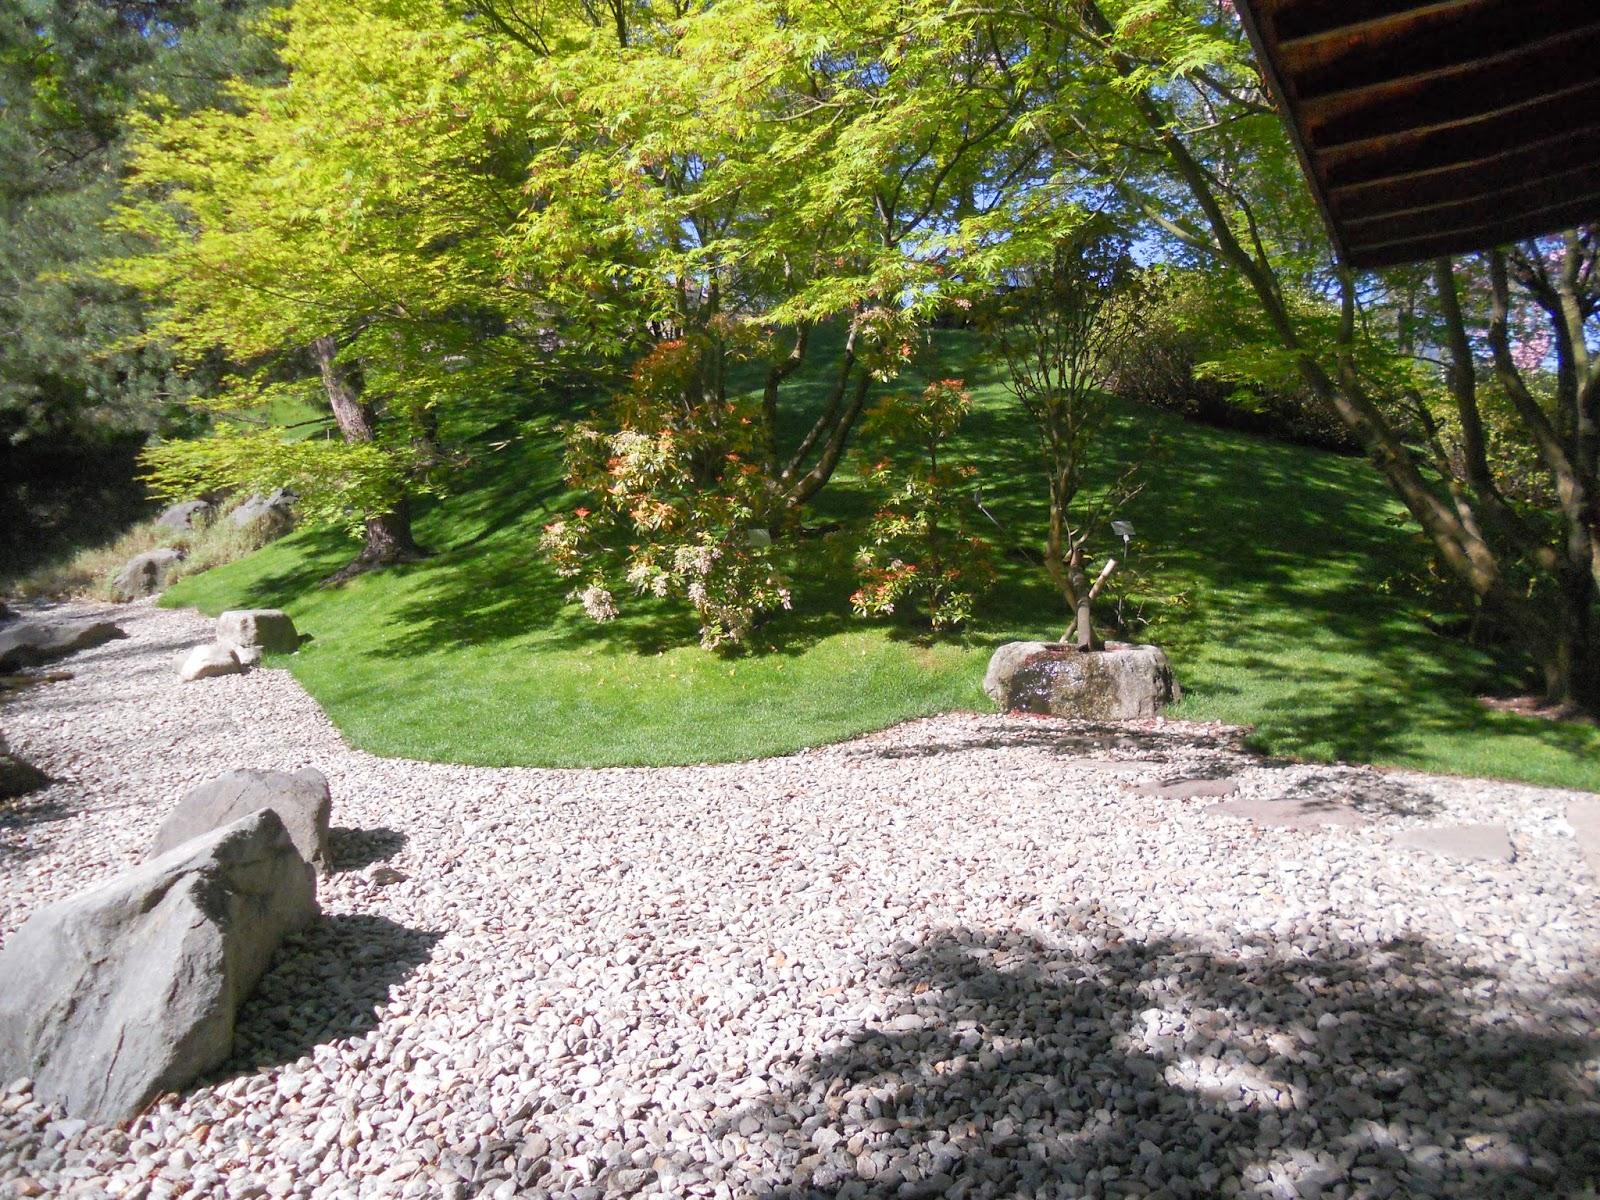 Gioco di luci giardino orientale trauttmansdorff merano for Giardino orientale